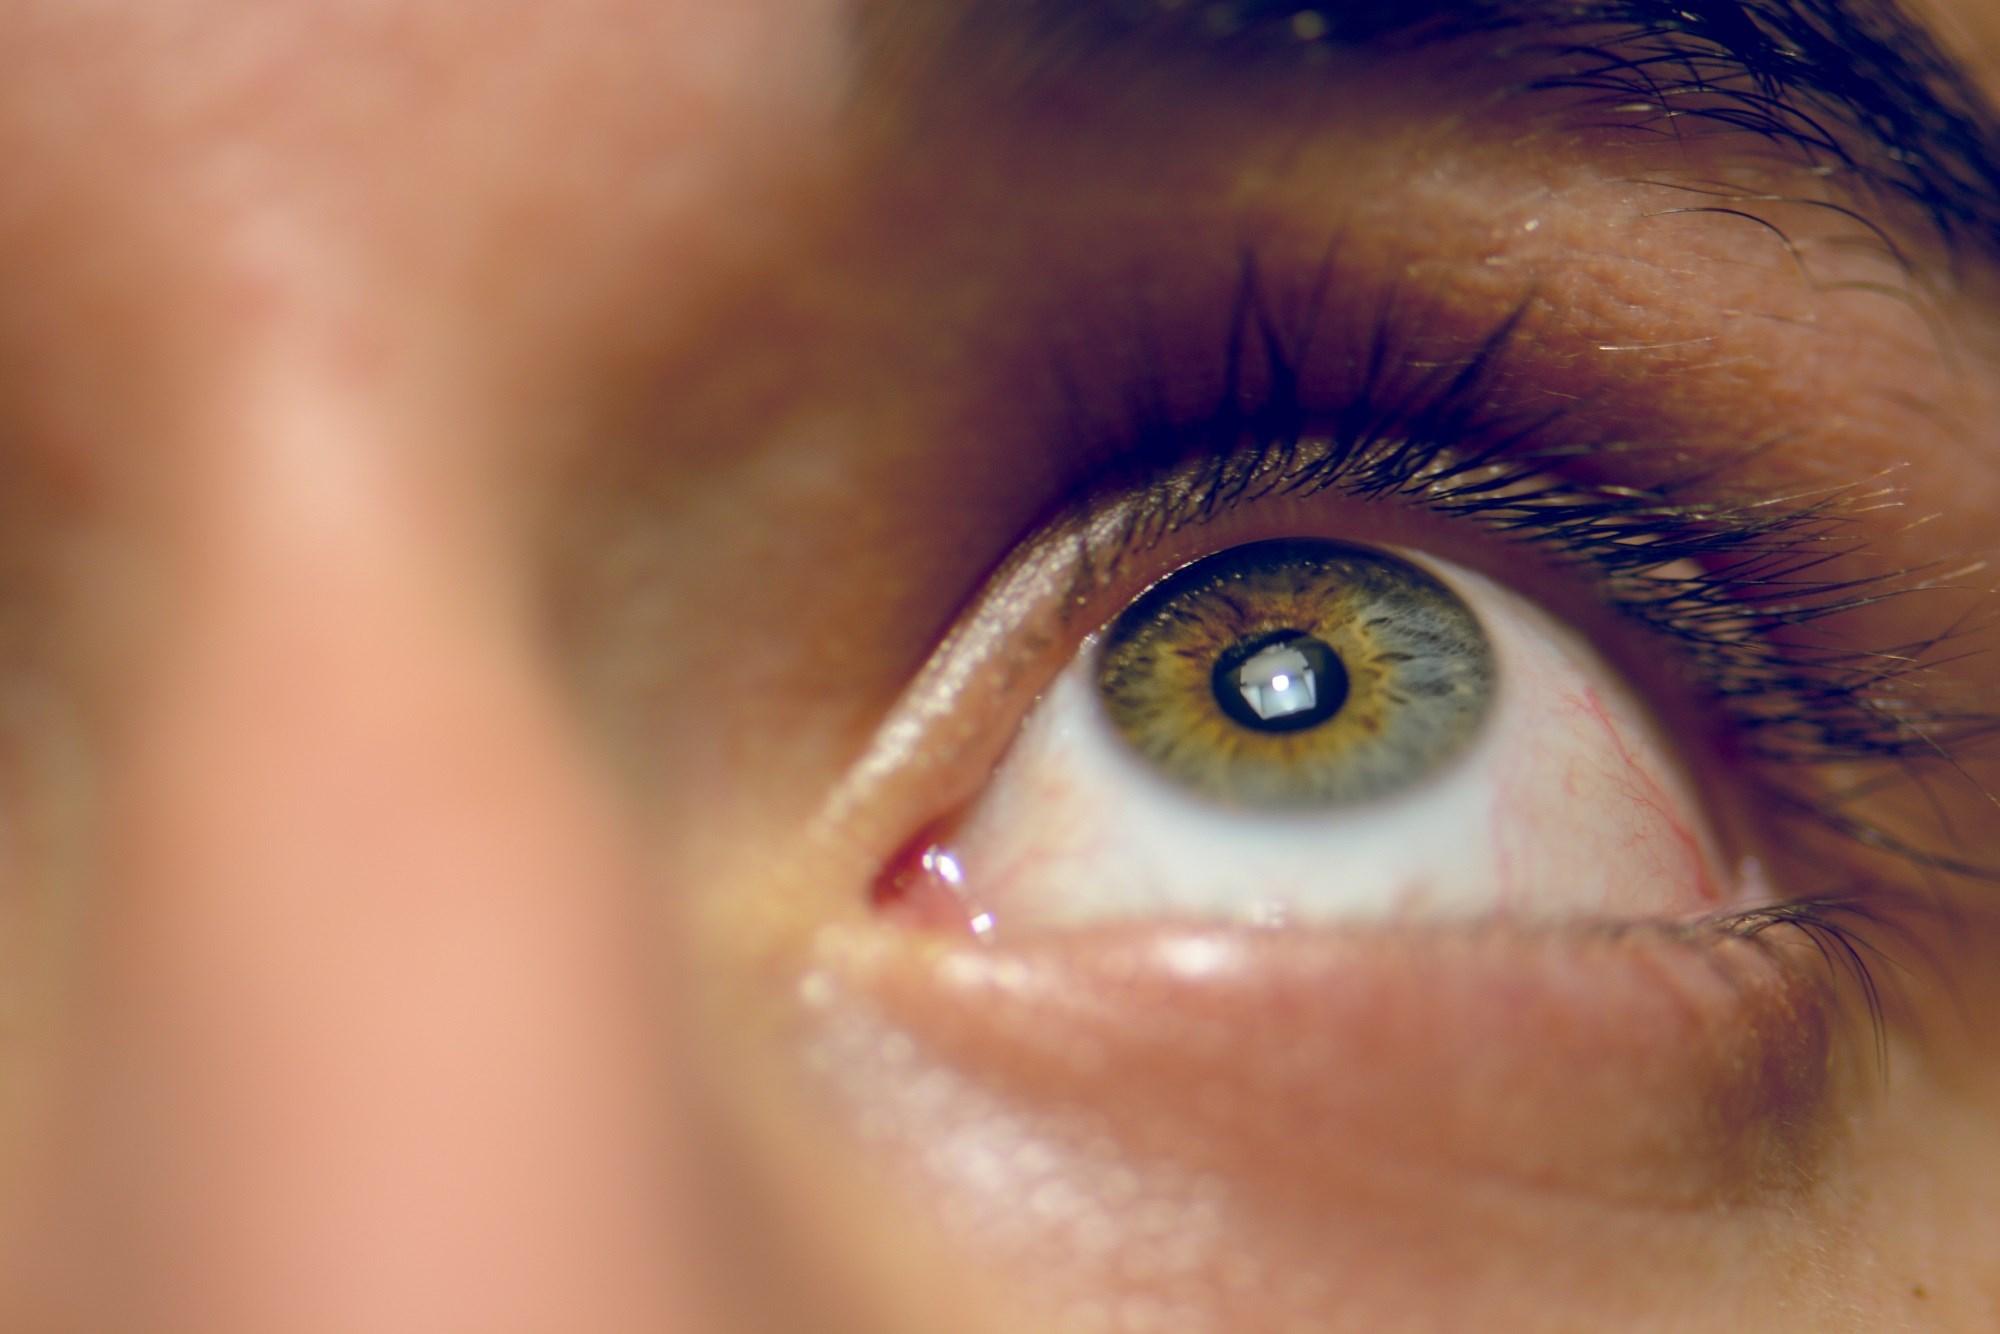 Link Found Between Eye Movement and Work Hours in Schizophrenia